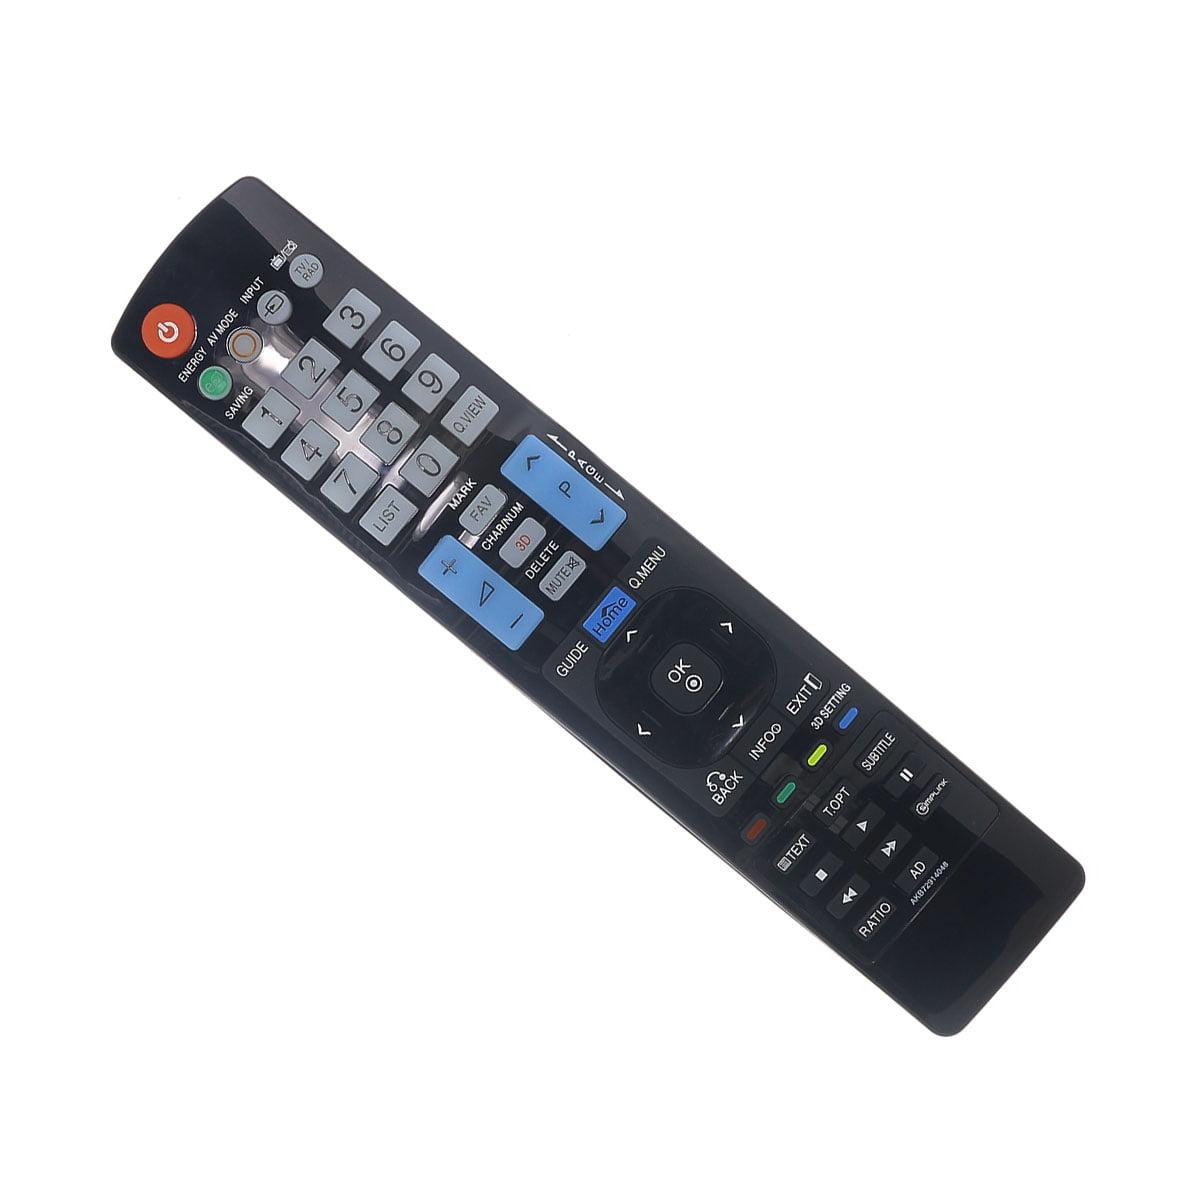 LG 42LE5350 TV WINDOWS 8 X64 TREIBER